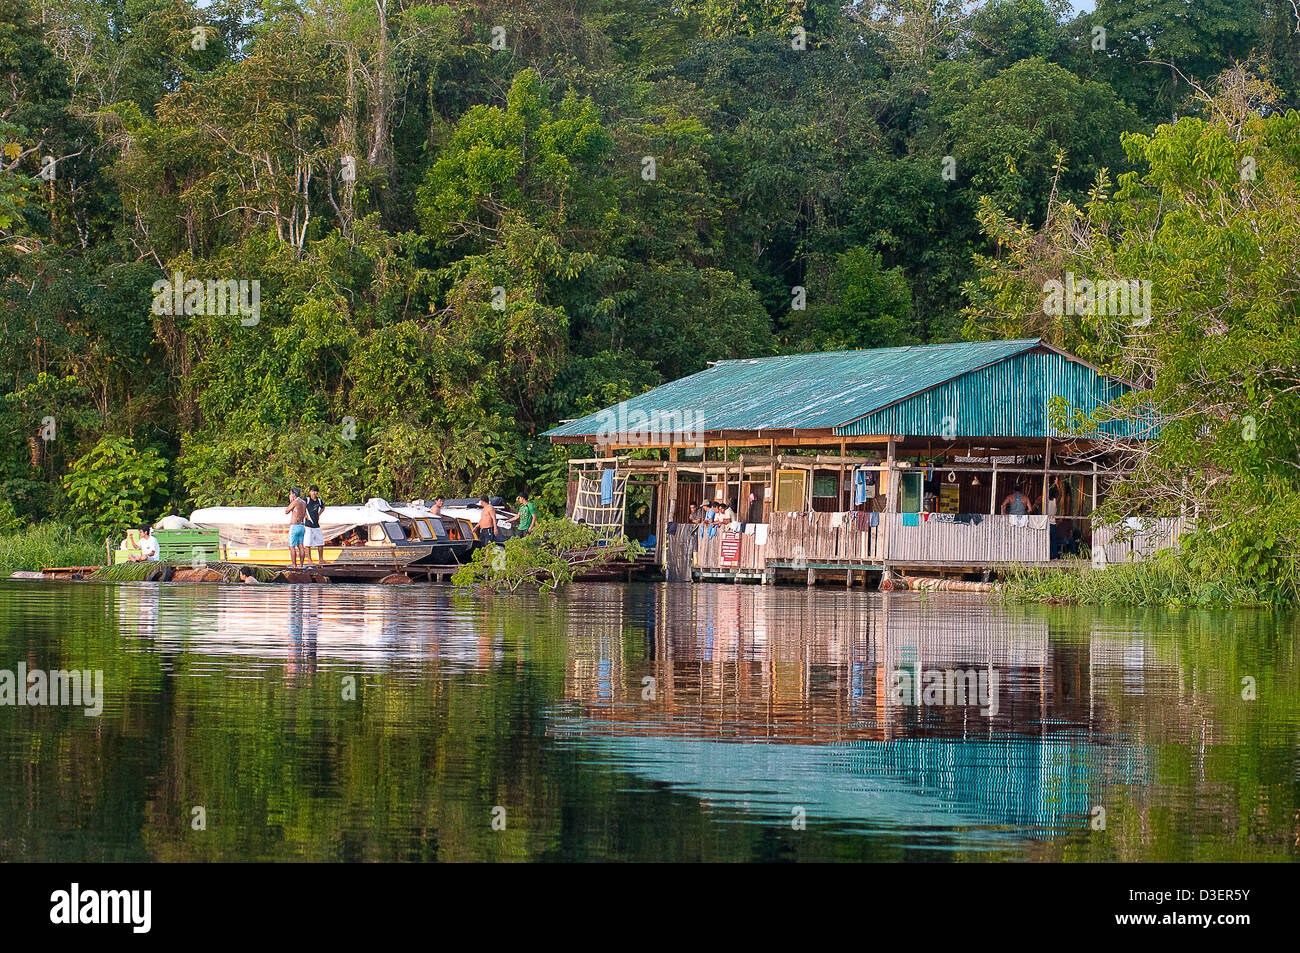 Peru, Loreto, Iquitos, Manatee project. The Yaku Taita's house at Cocha Dorado, Pacaya Samiria national reserve - Stock Image